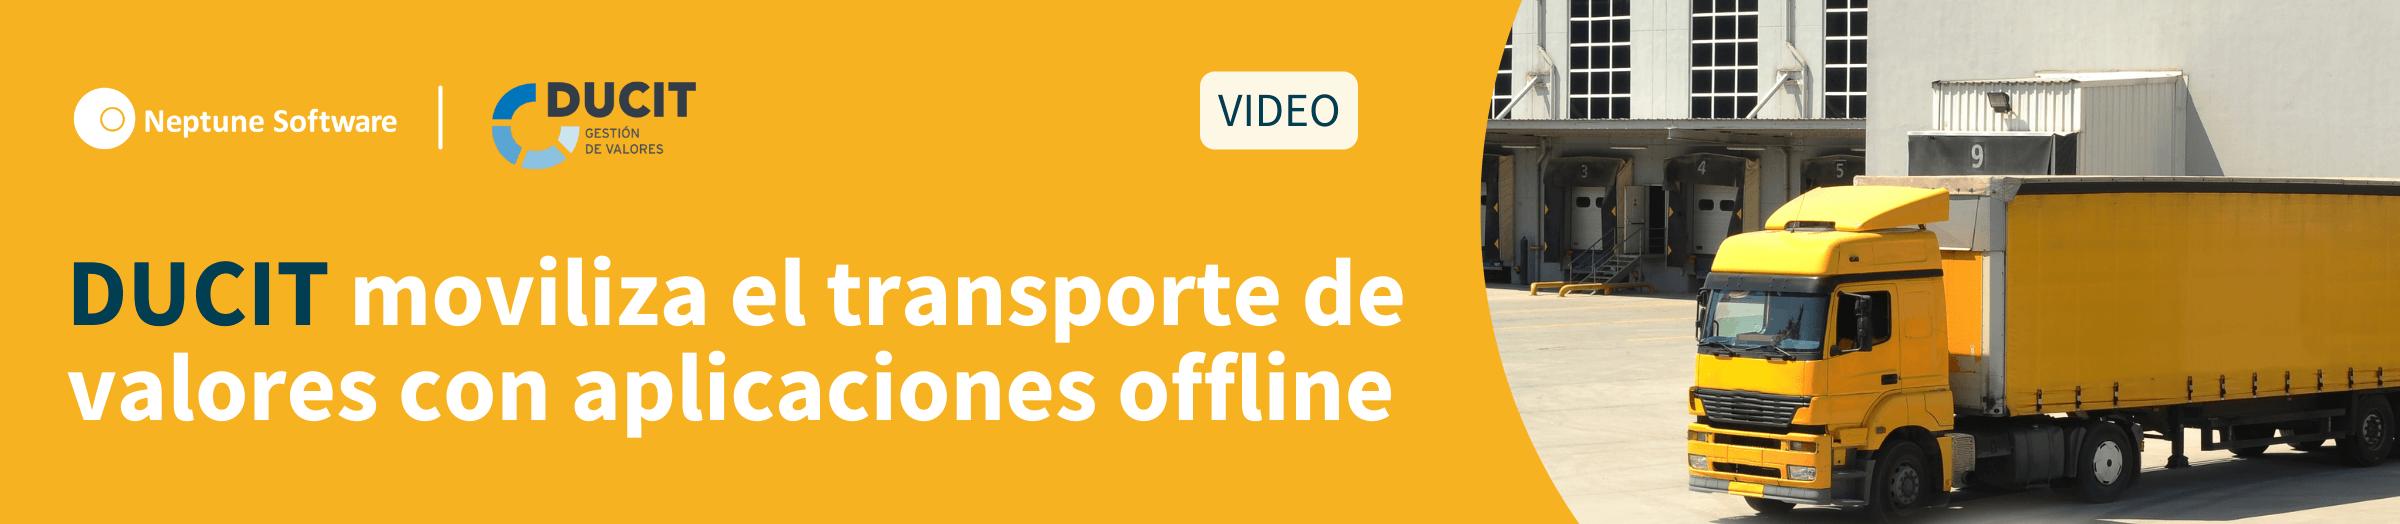 Ducit Webinar Spanish